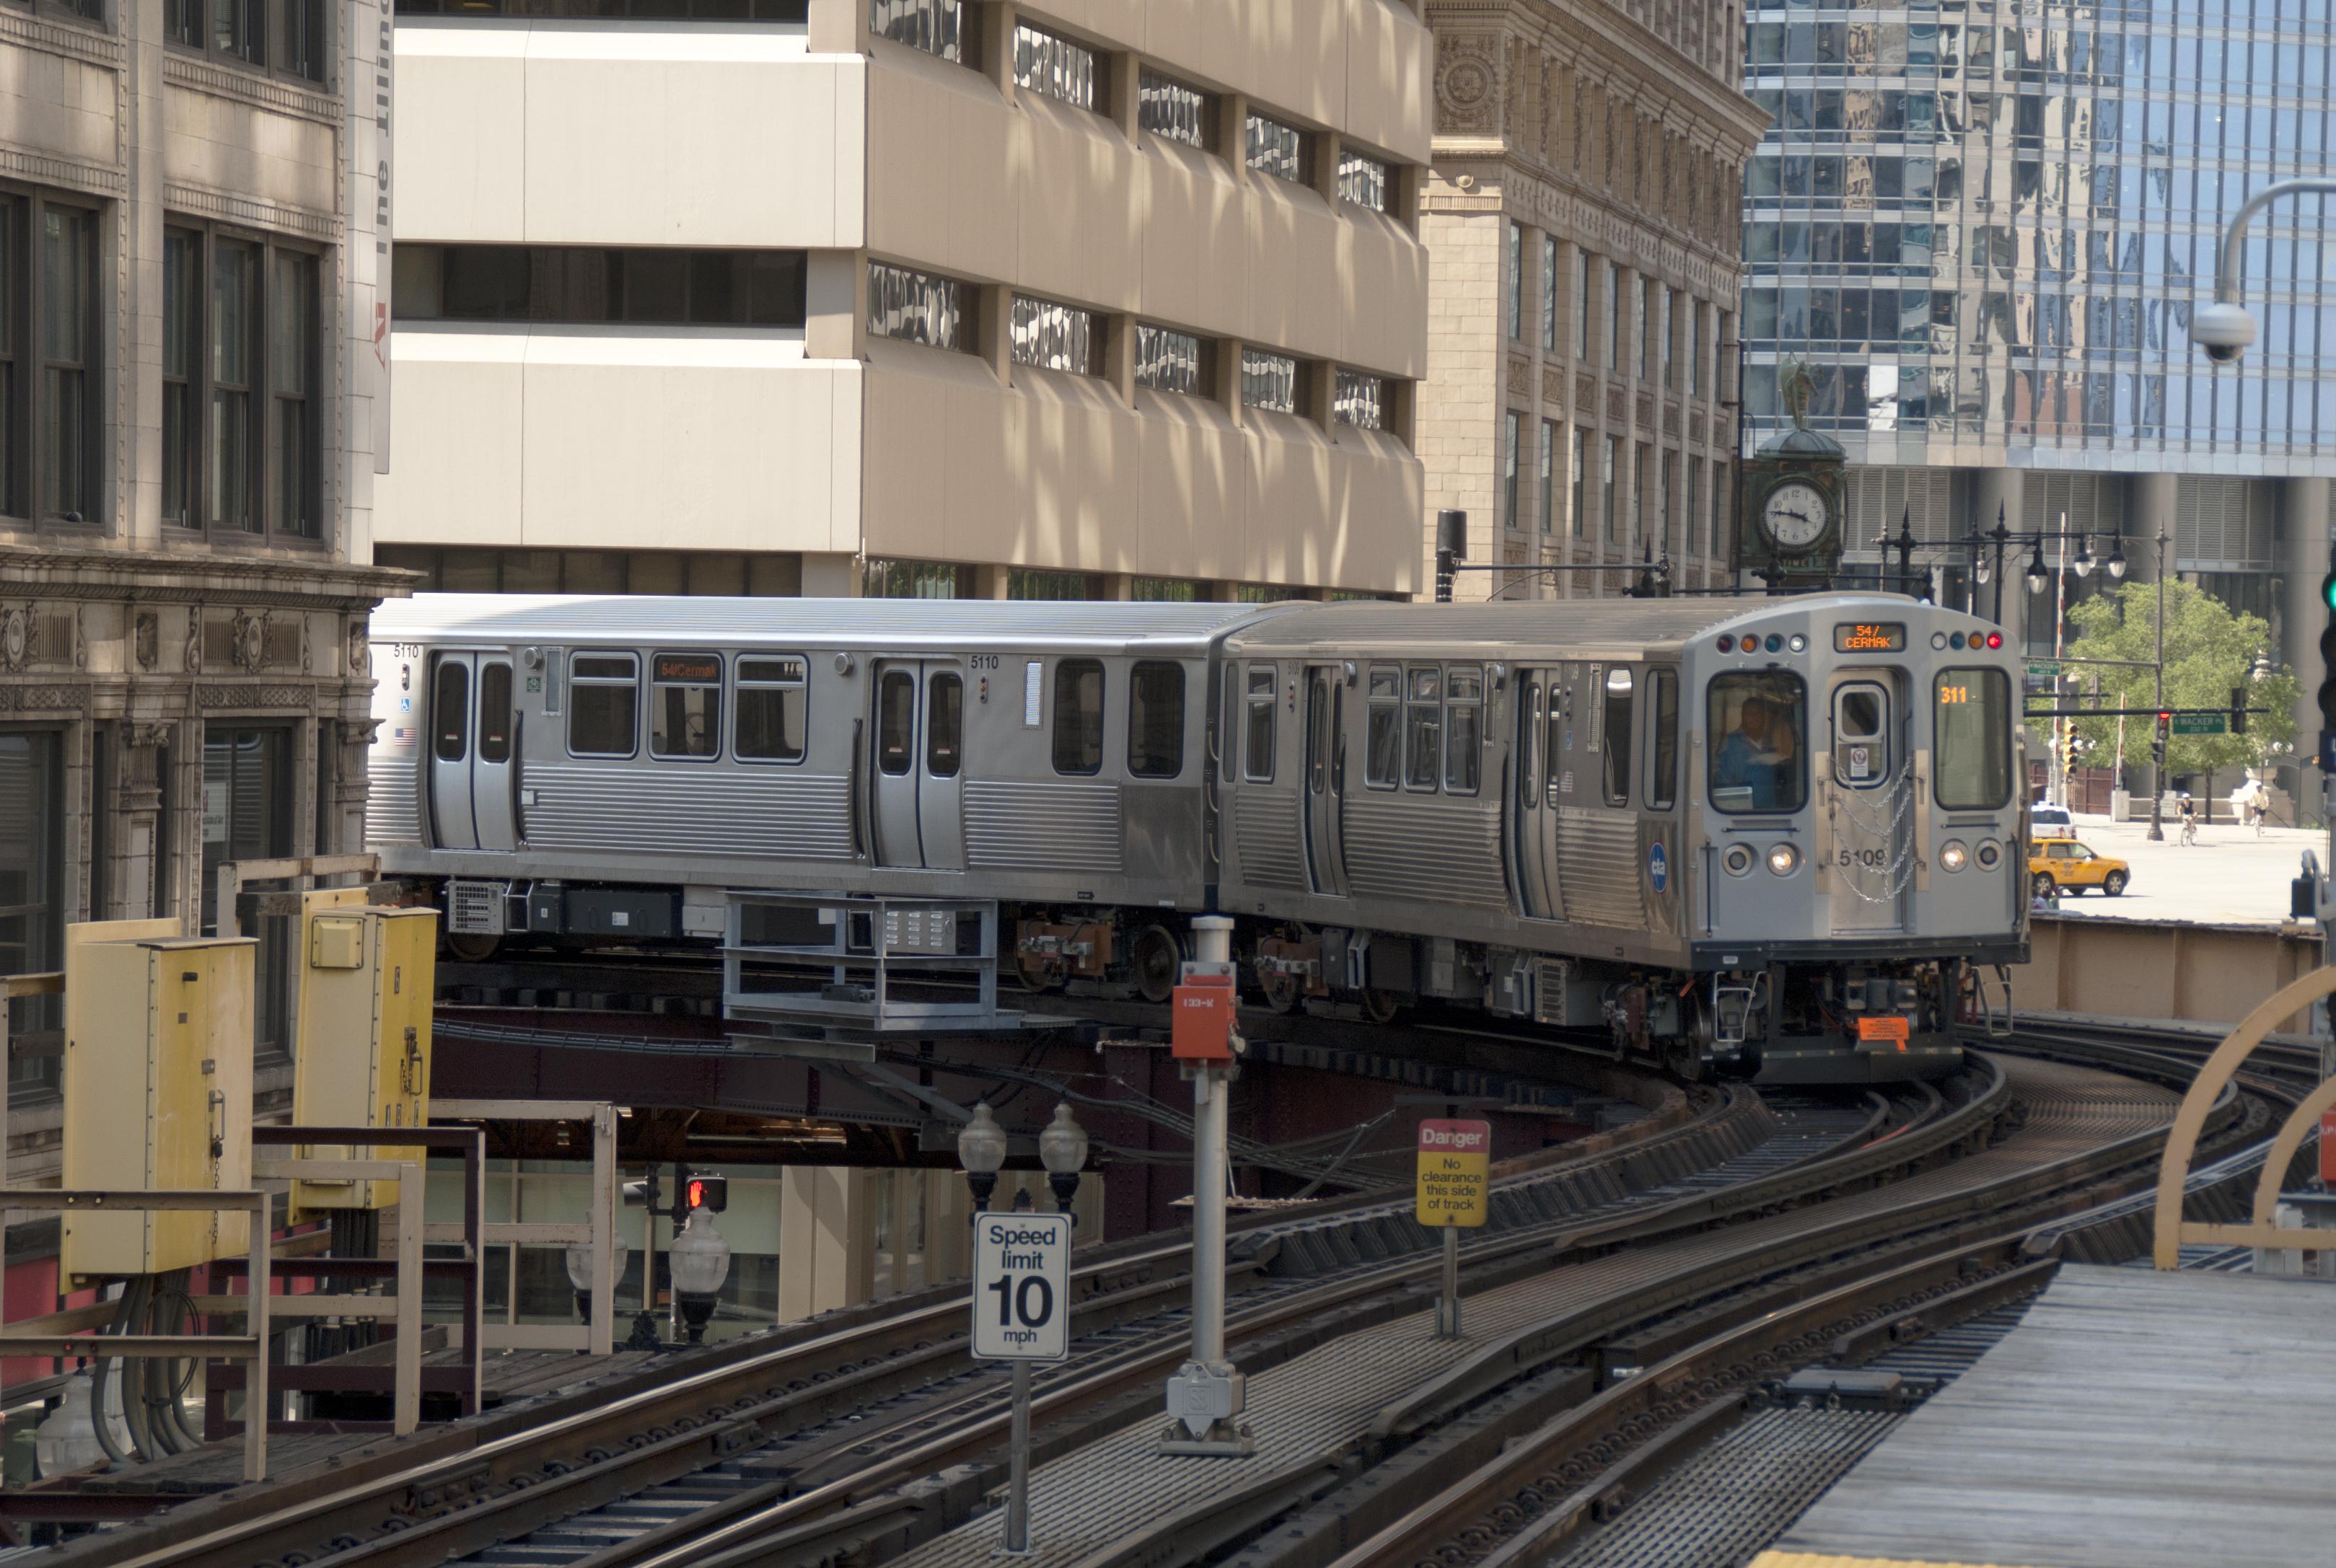 Cta Subway Map Chicago.Chicago L Wikipedia